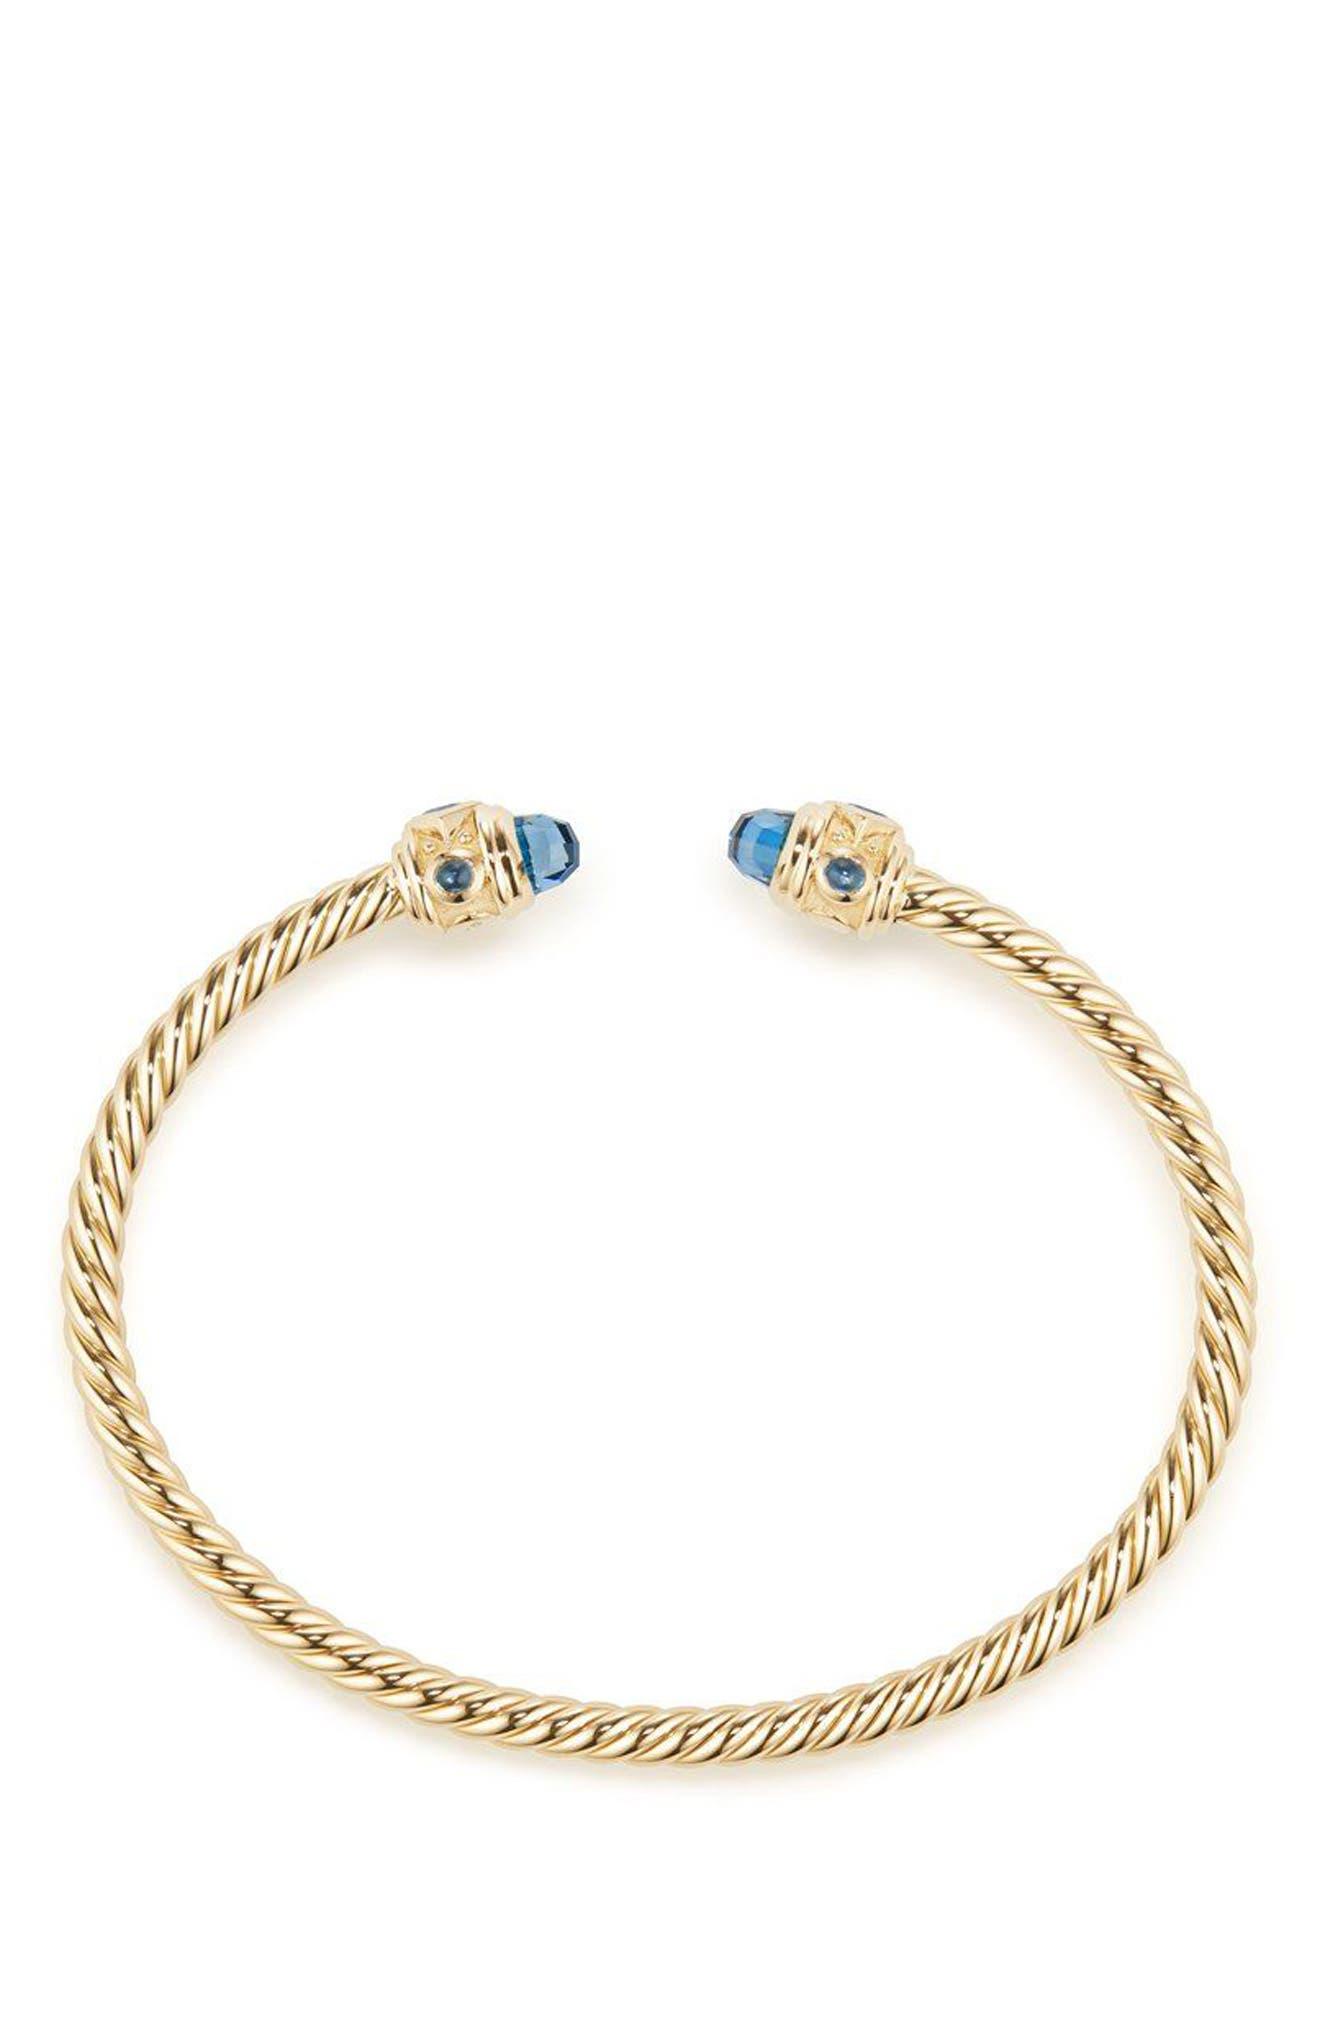 DAVID YURMAN, Renaissance Bracelet in 18K Gold, 3.5mm, Alternate thumbnail 2, color, GOLD/ HAMPTON BLUE TOPAZ